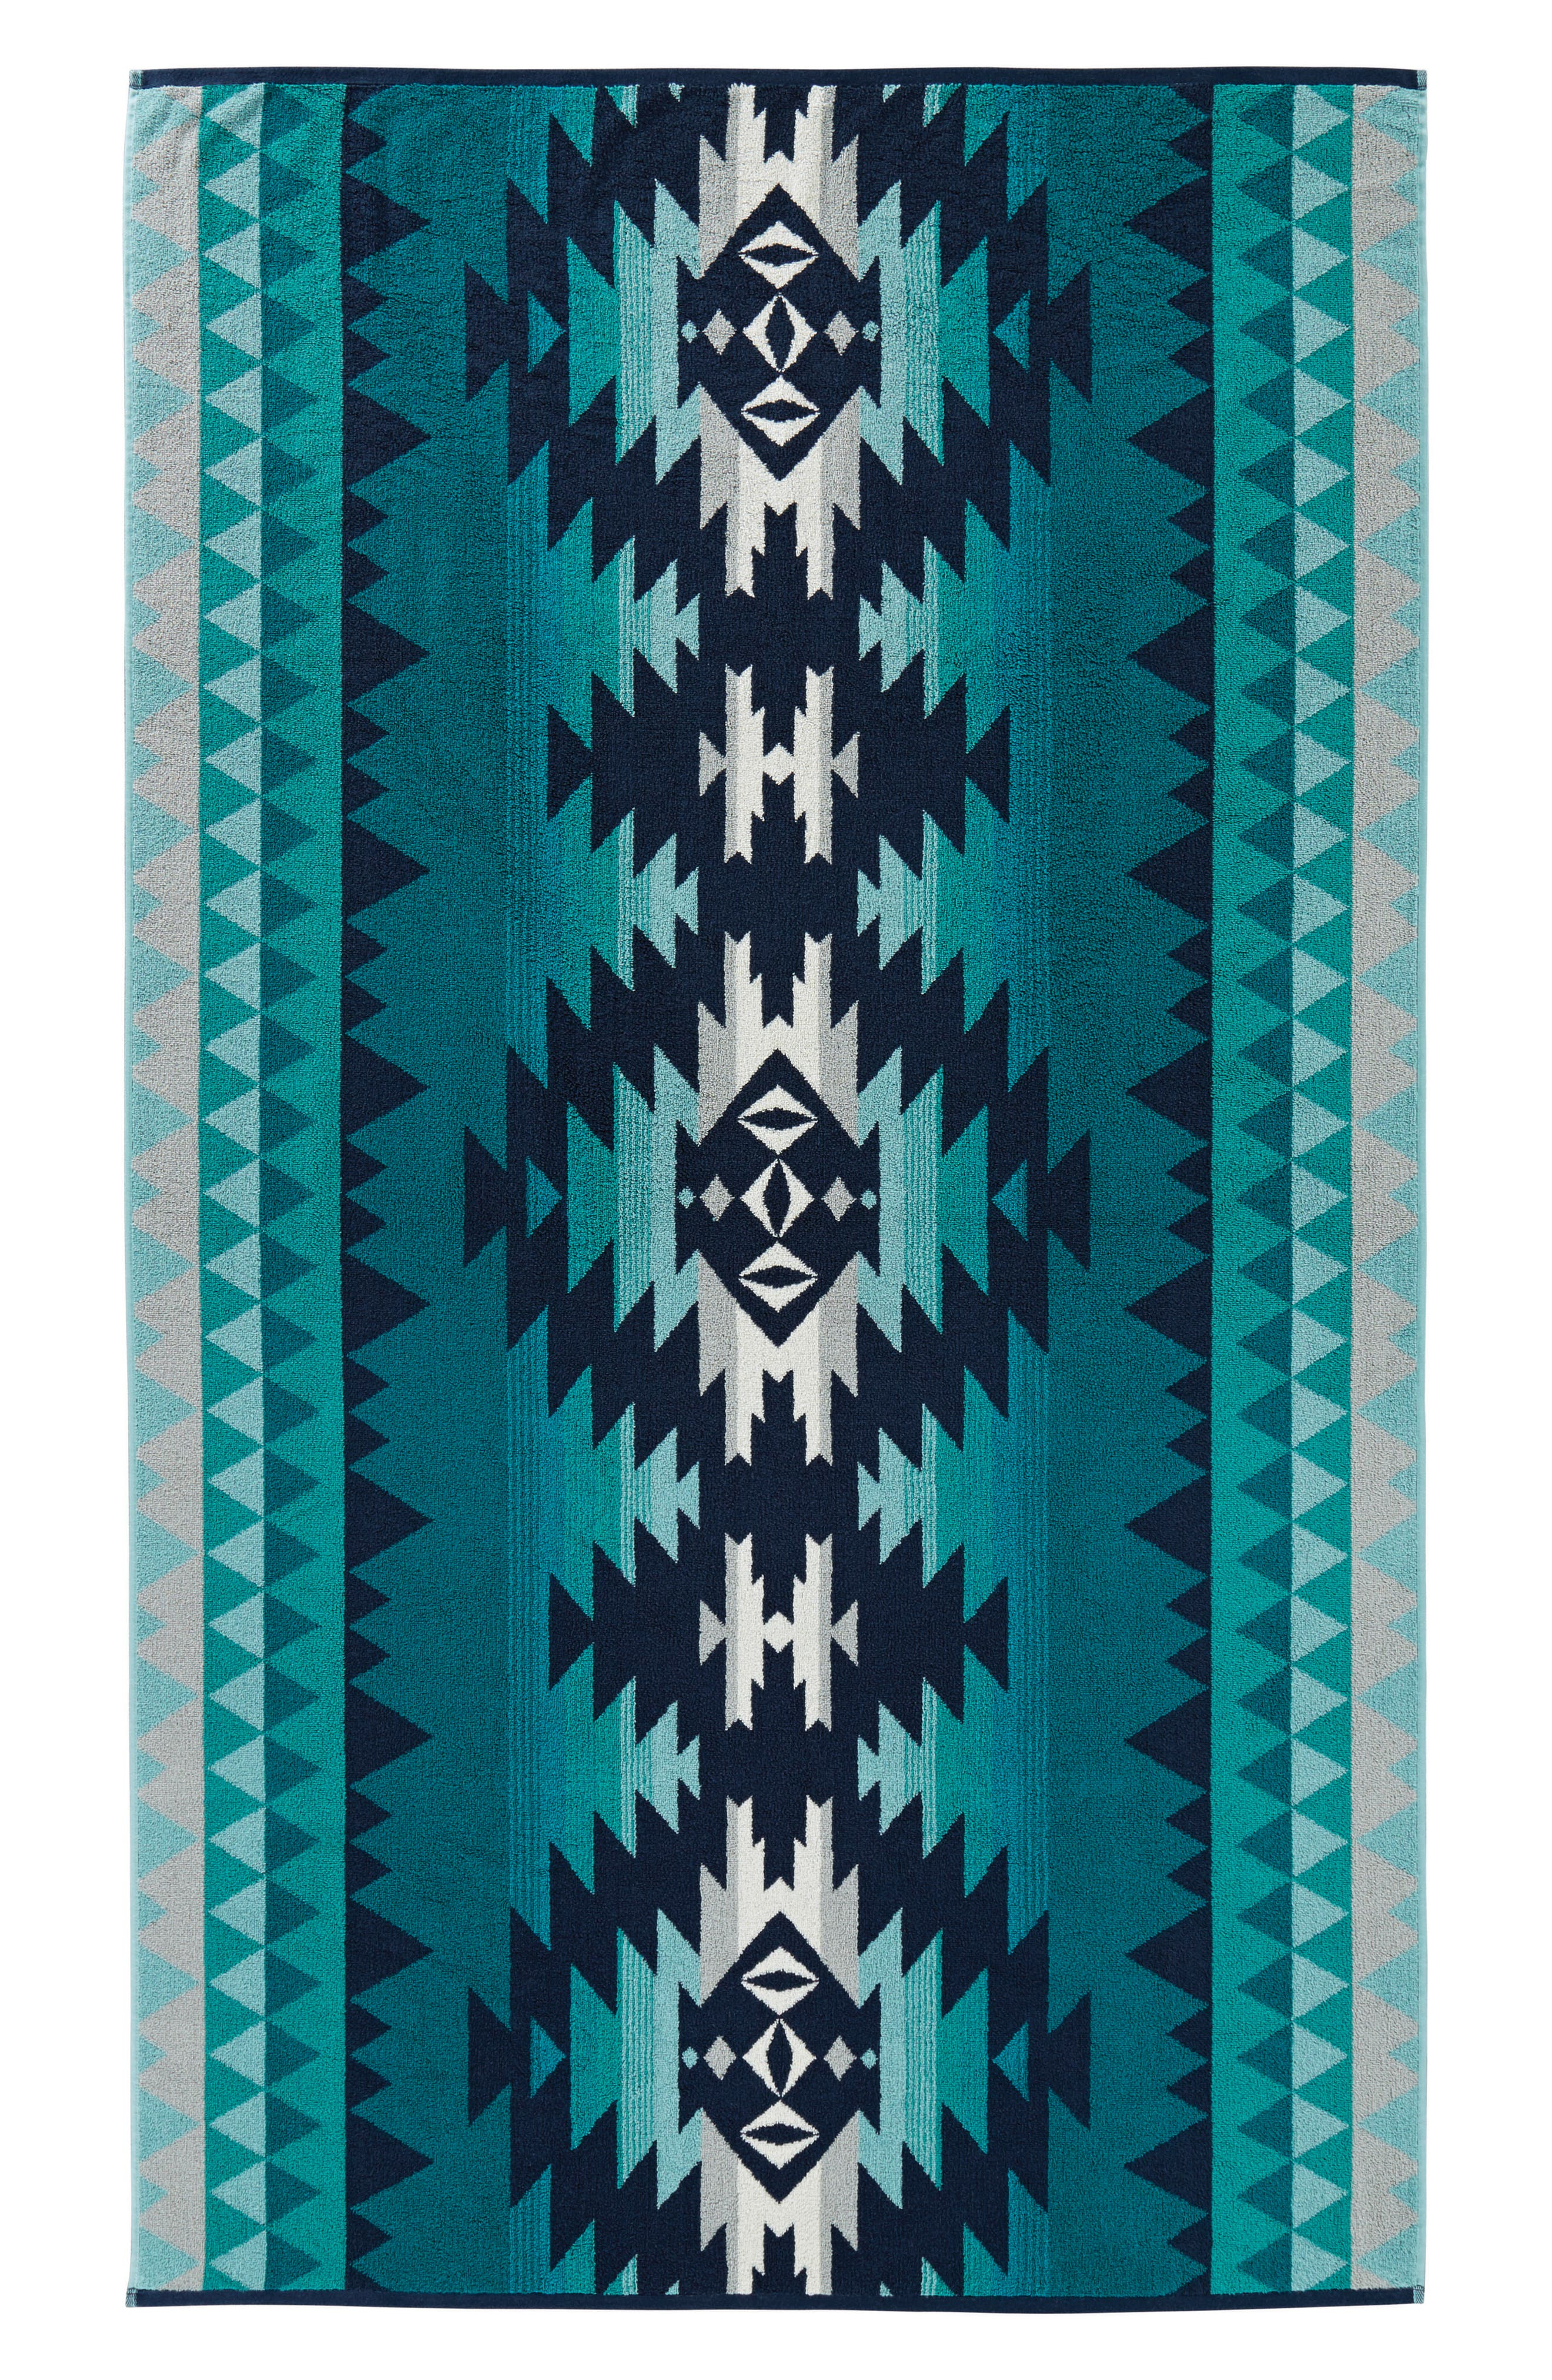 Papago Park Spa Towel,                             Alternate thumbnail 2, color,                             400